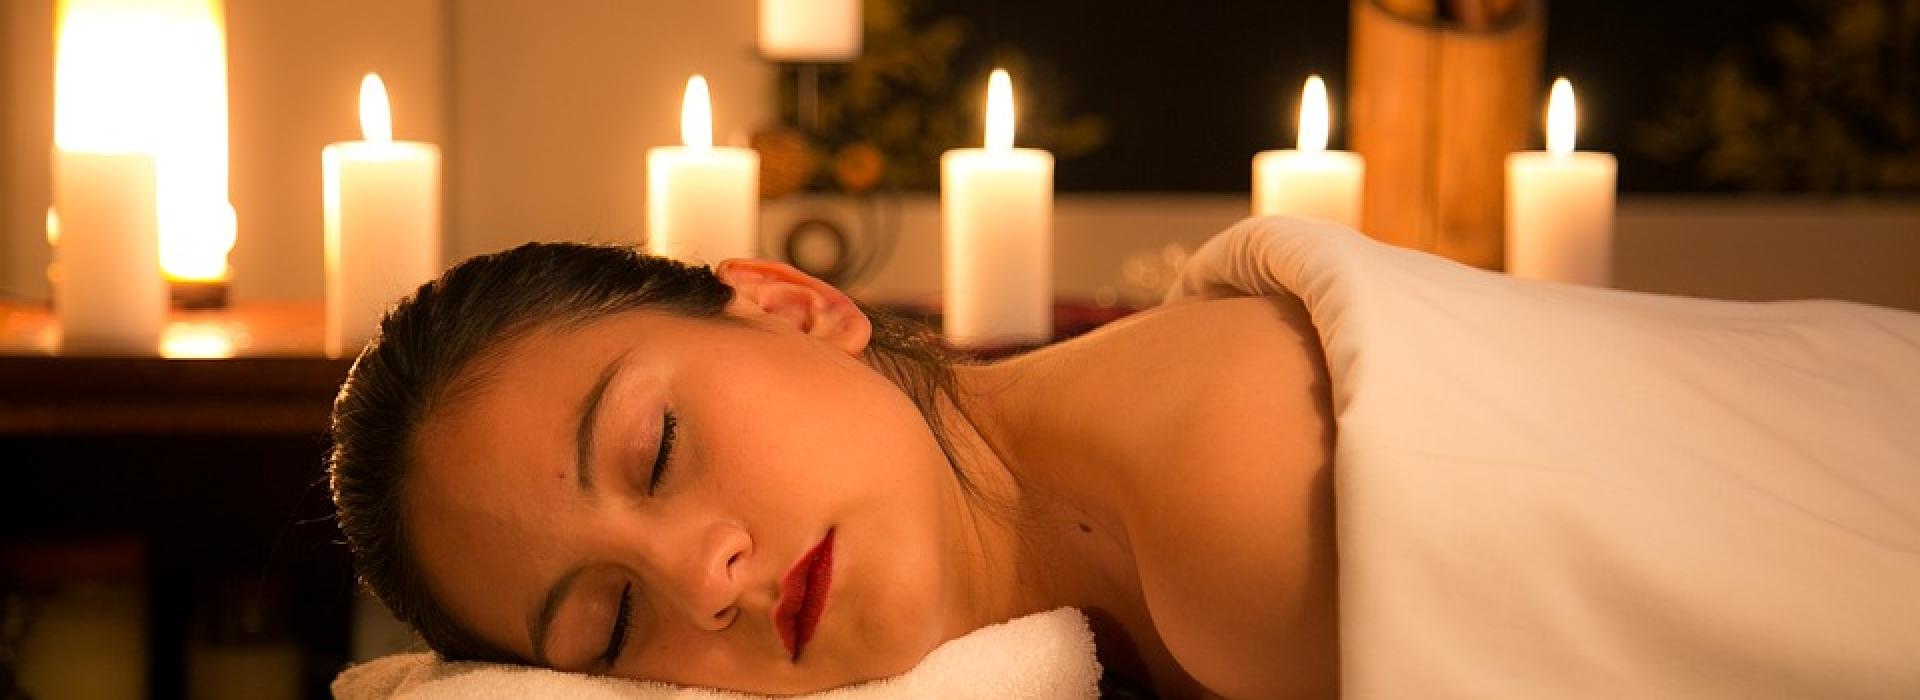 Ying Ying Massage